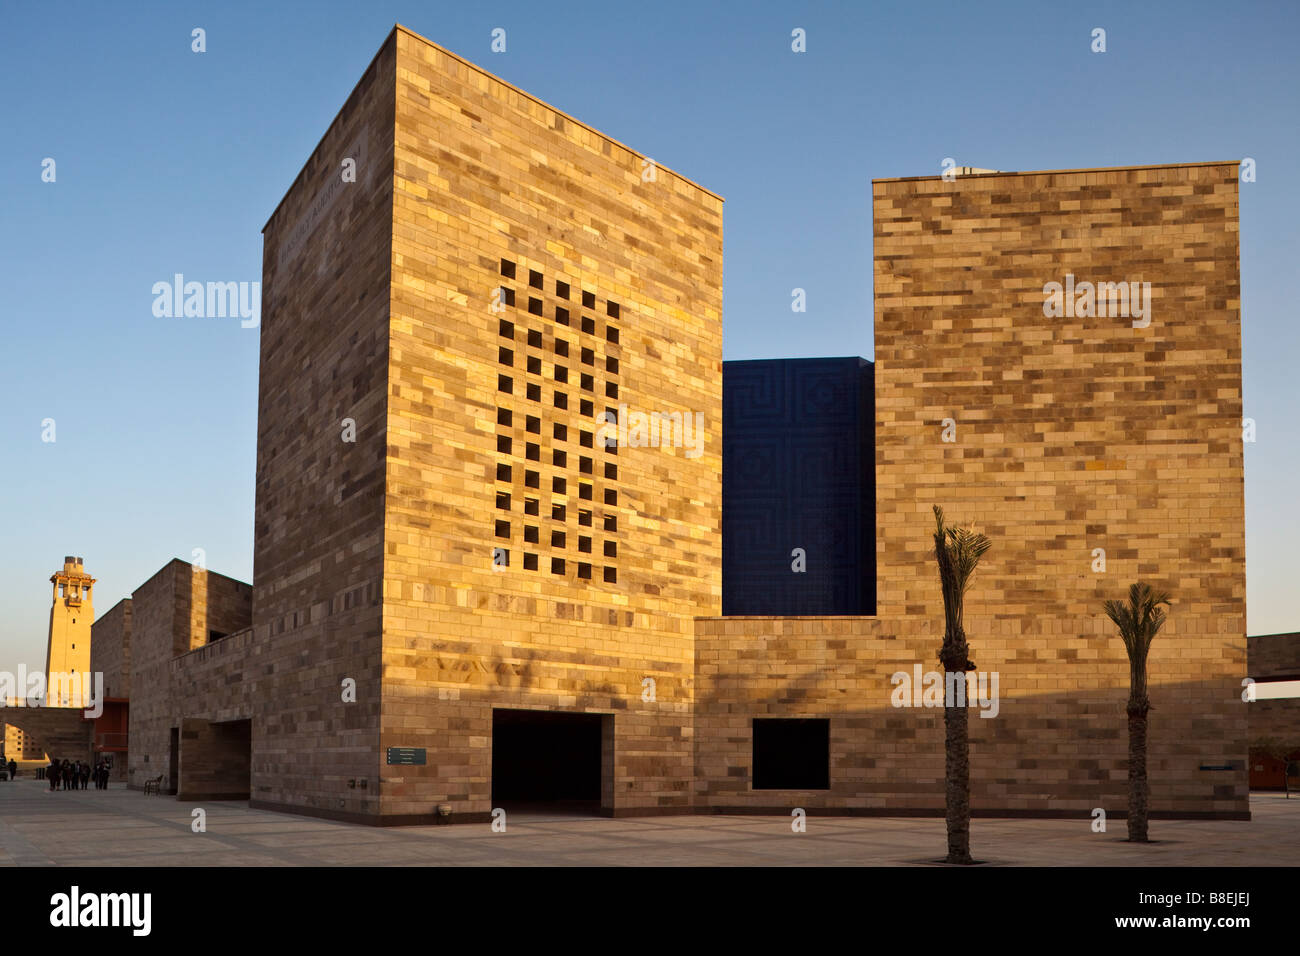 bassily auditorium american university in cairo new. Black Bedroom Furniture Sets. Home Design Ideas